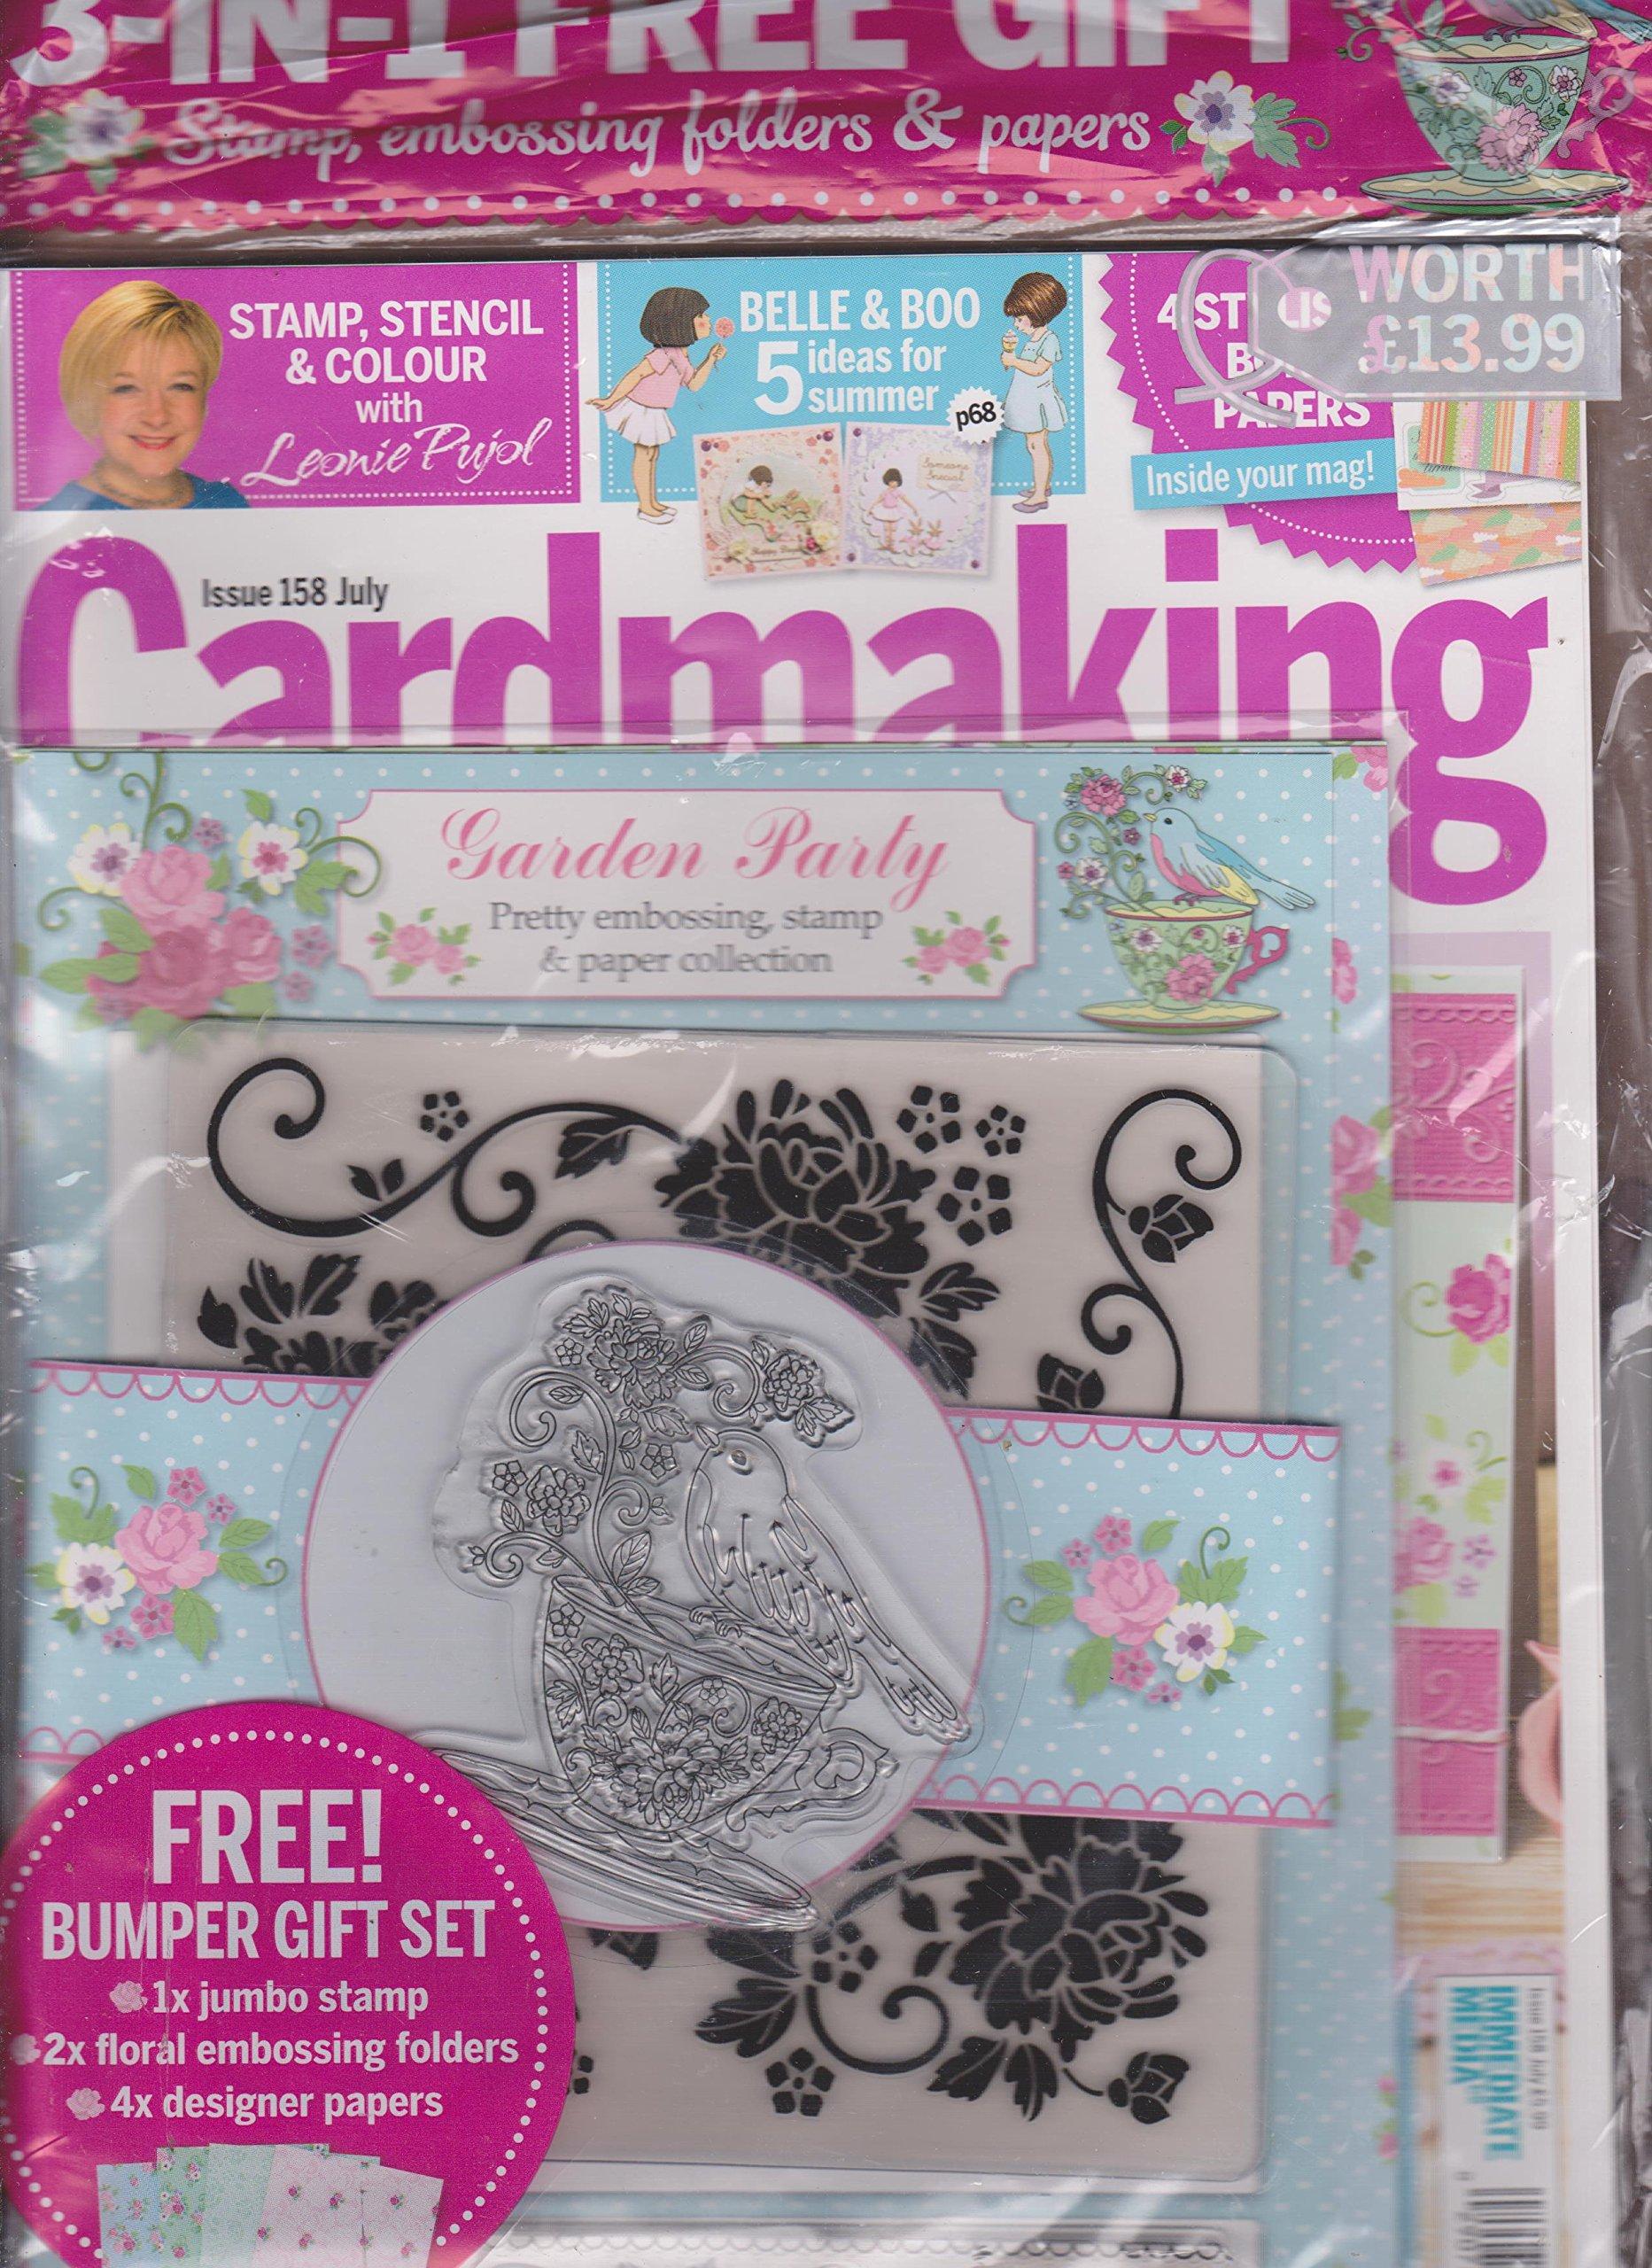 Cardmaking & Papercraft Magazine Issue 158 July 2016 ebook